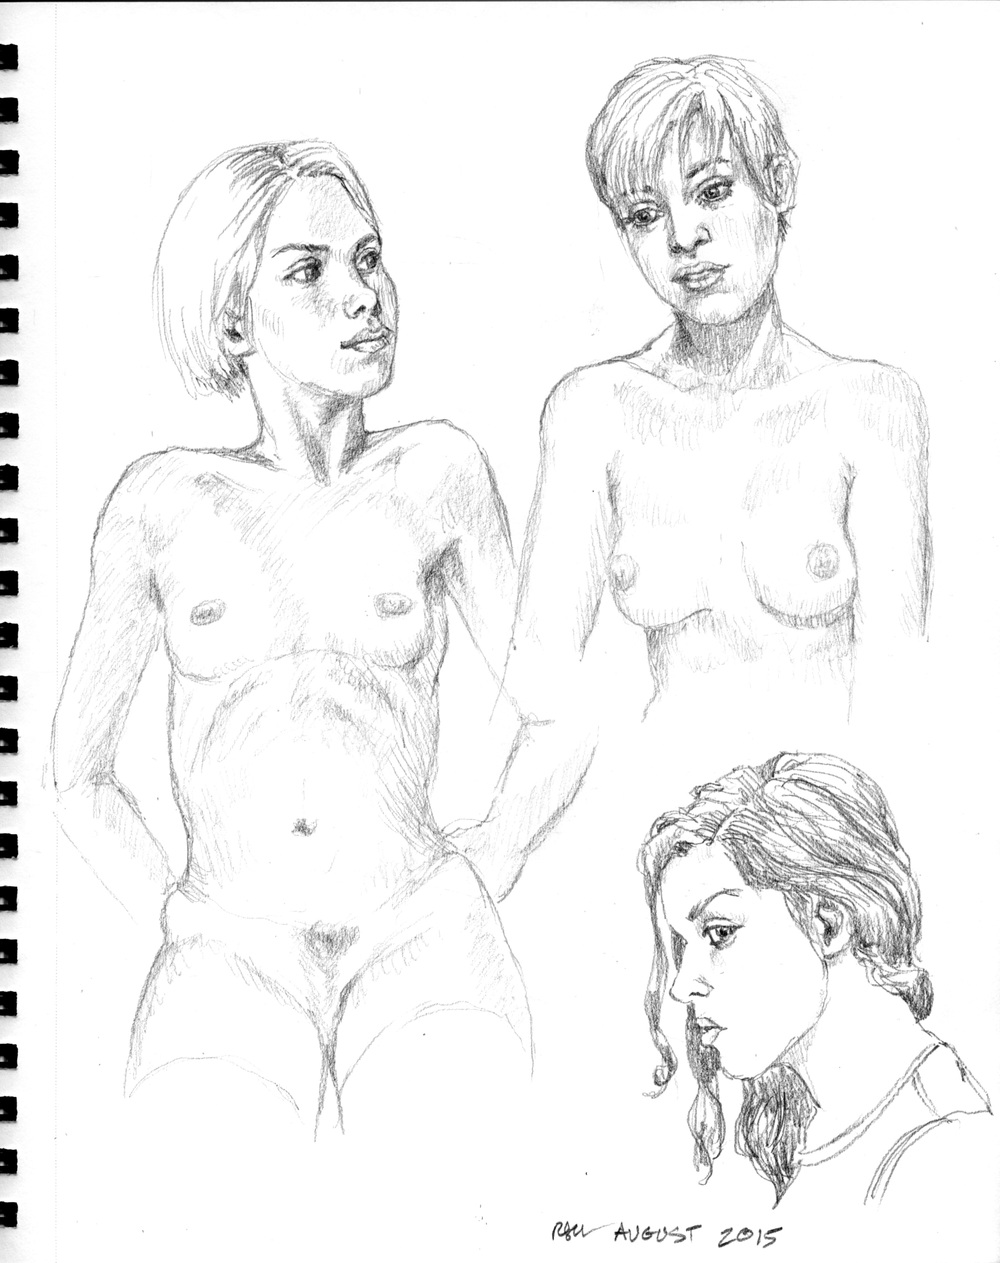 August sept 2015 sketches_282.jpg